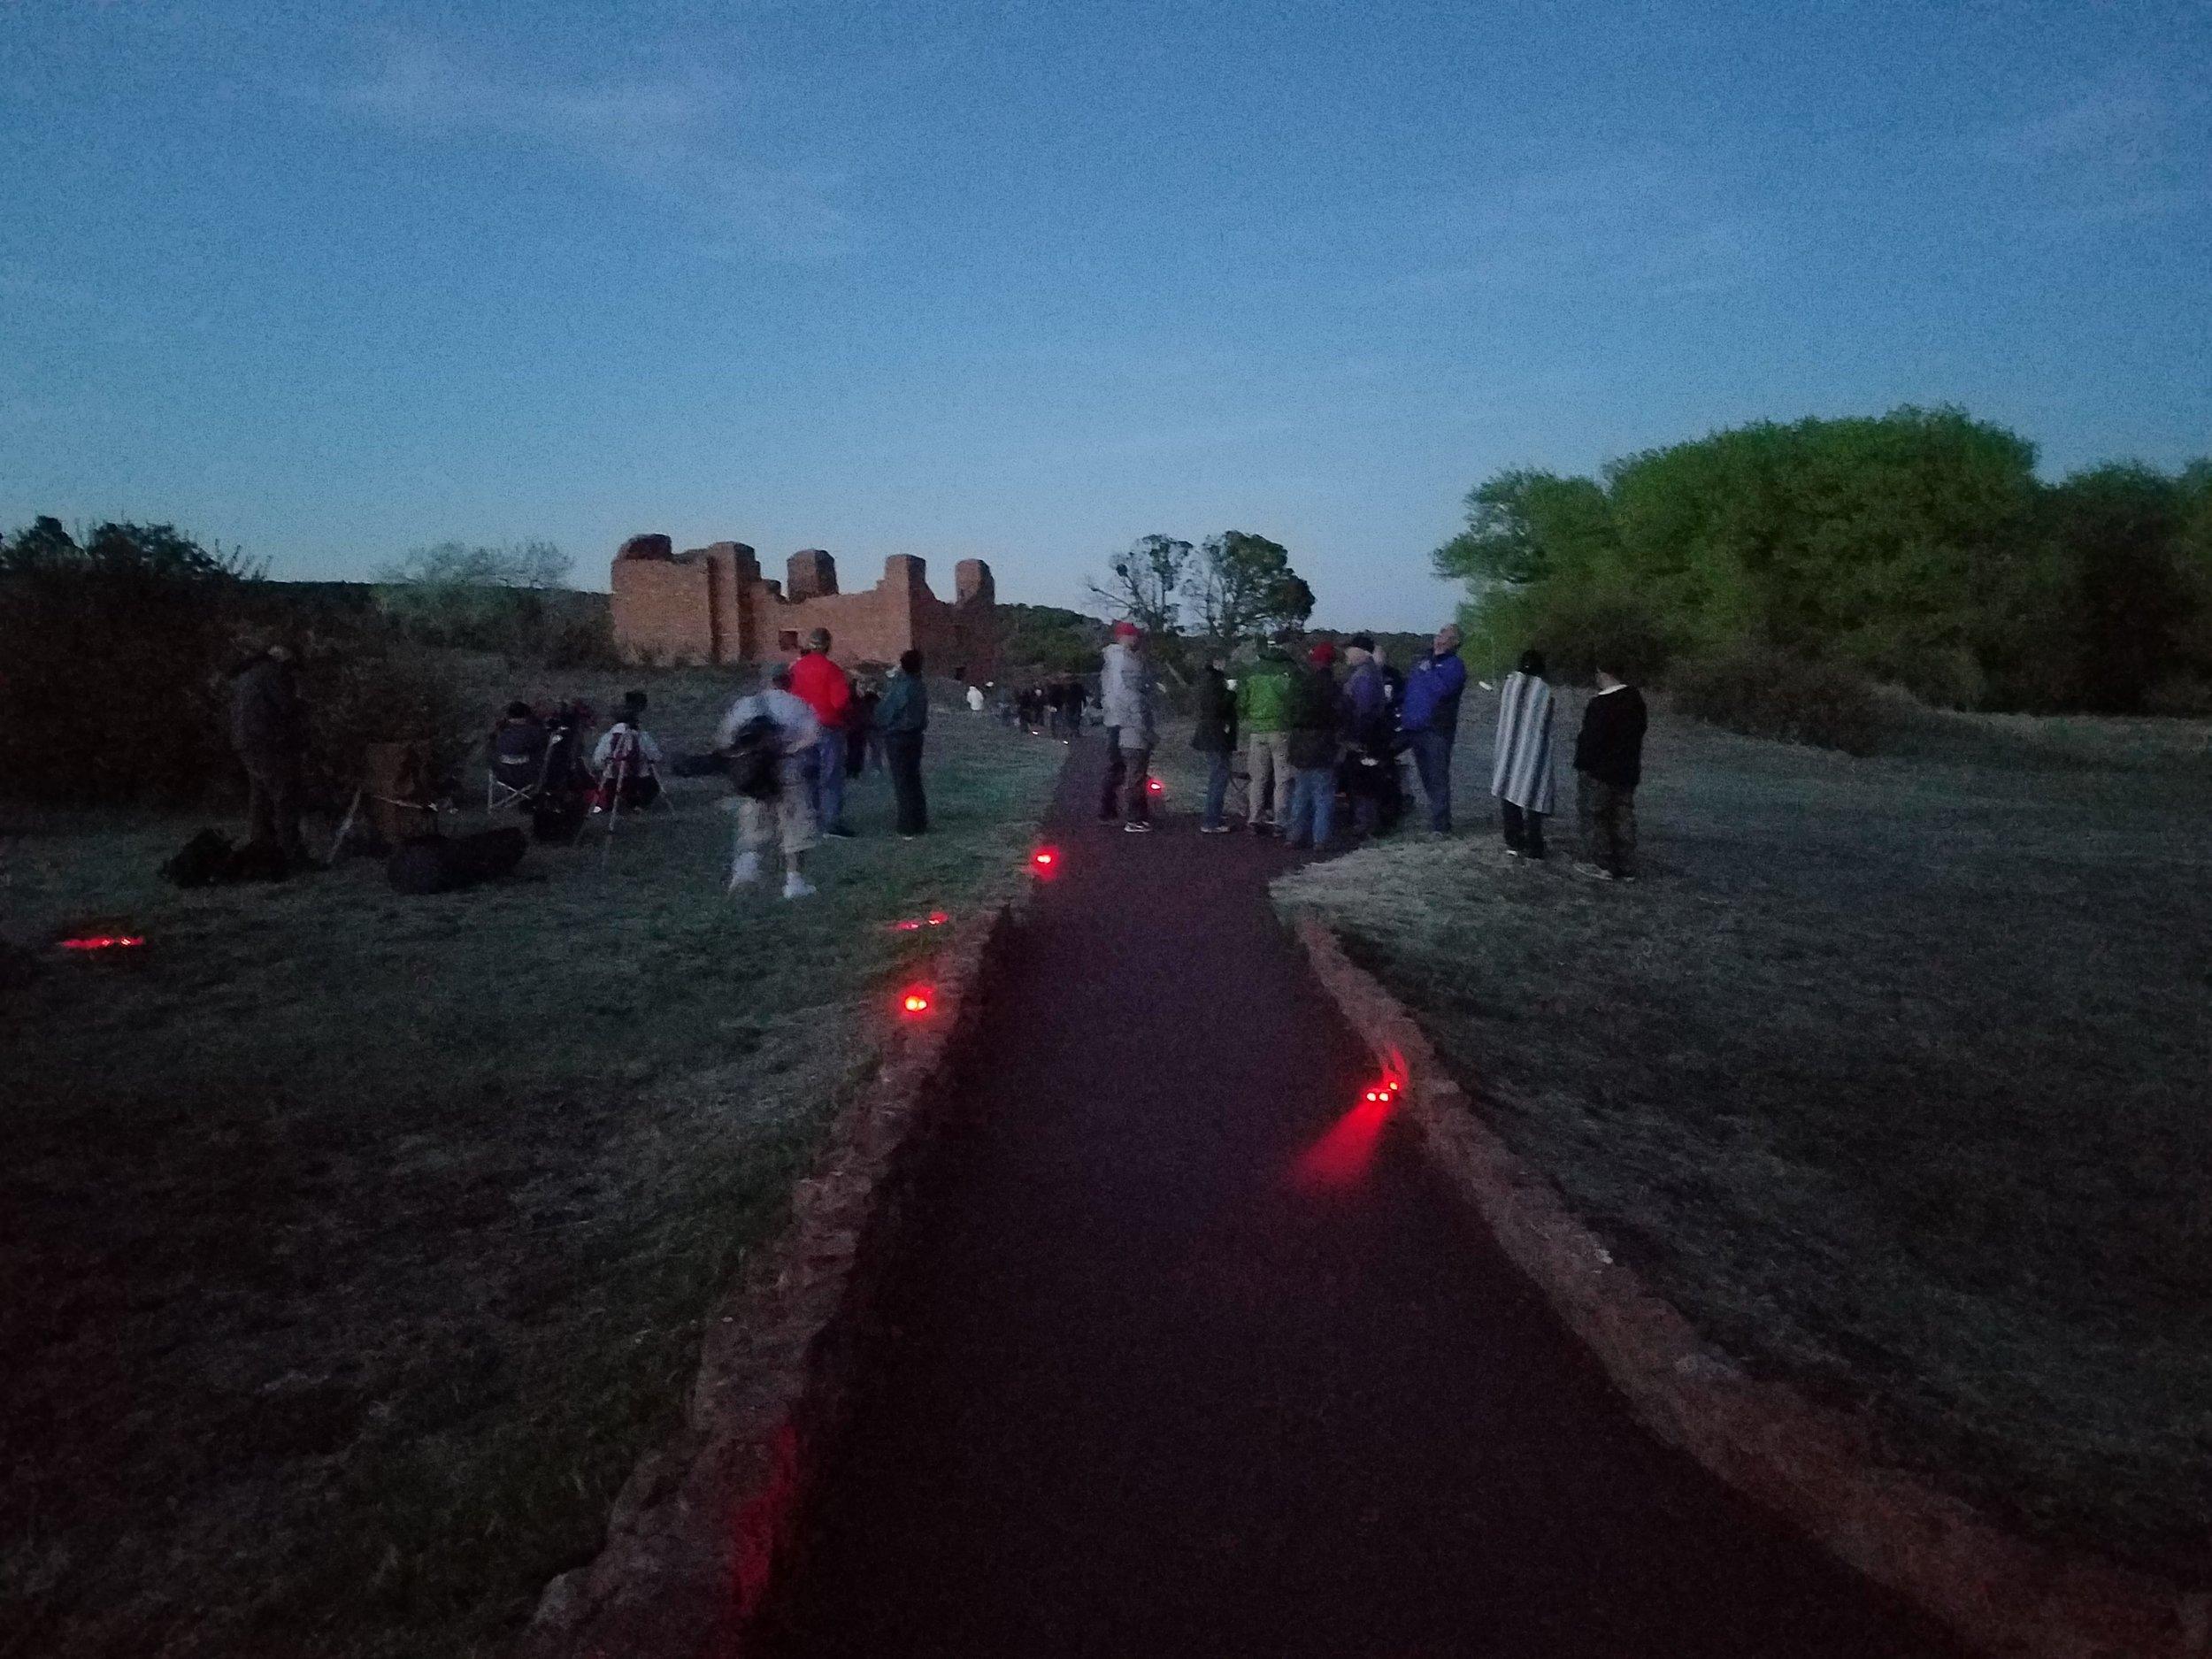 Downward poiting red path lighting at Quarai